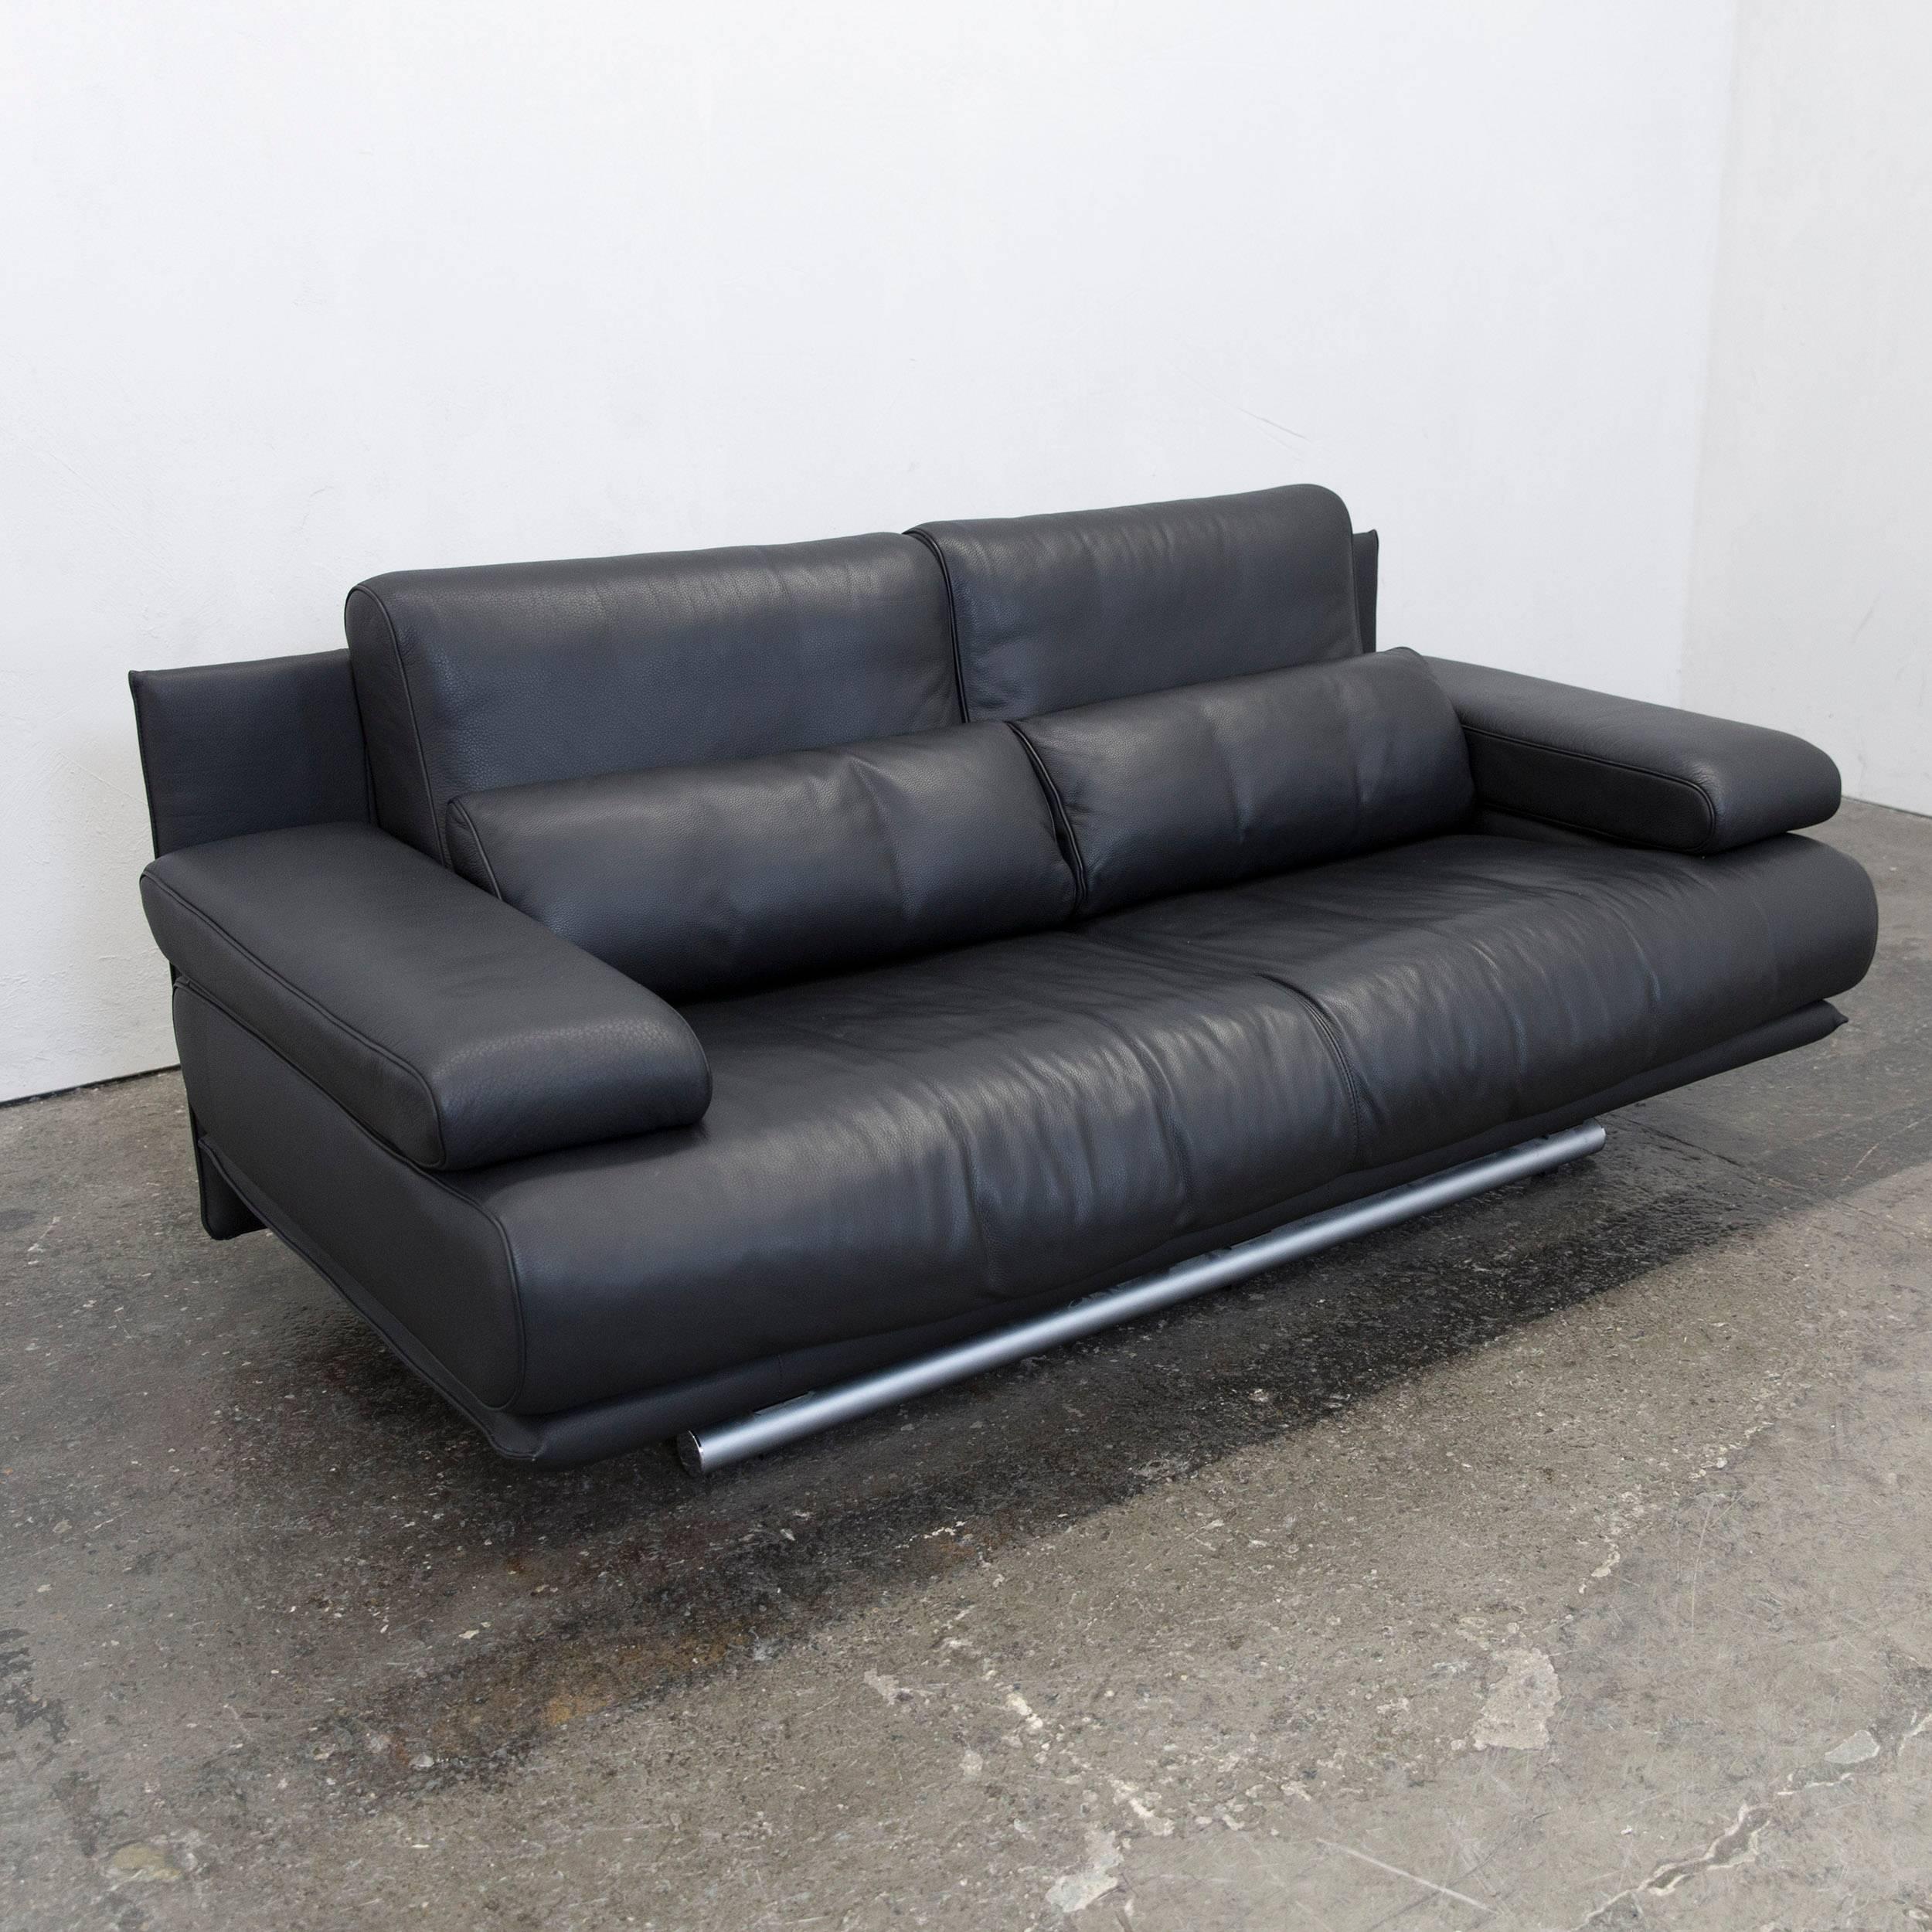 Sofa schwarz full size of schwarz weiss sofa und modern for Rolf benz big sofa